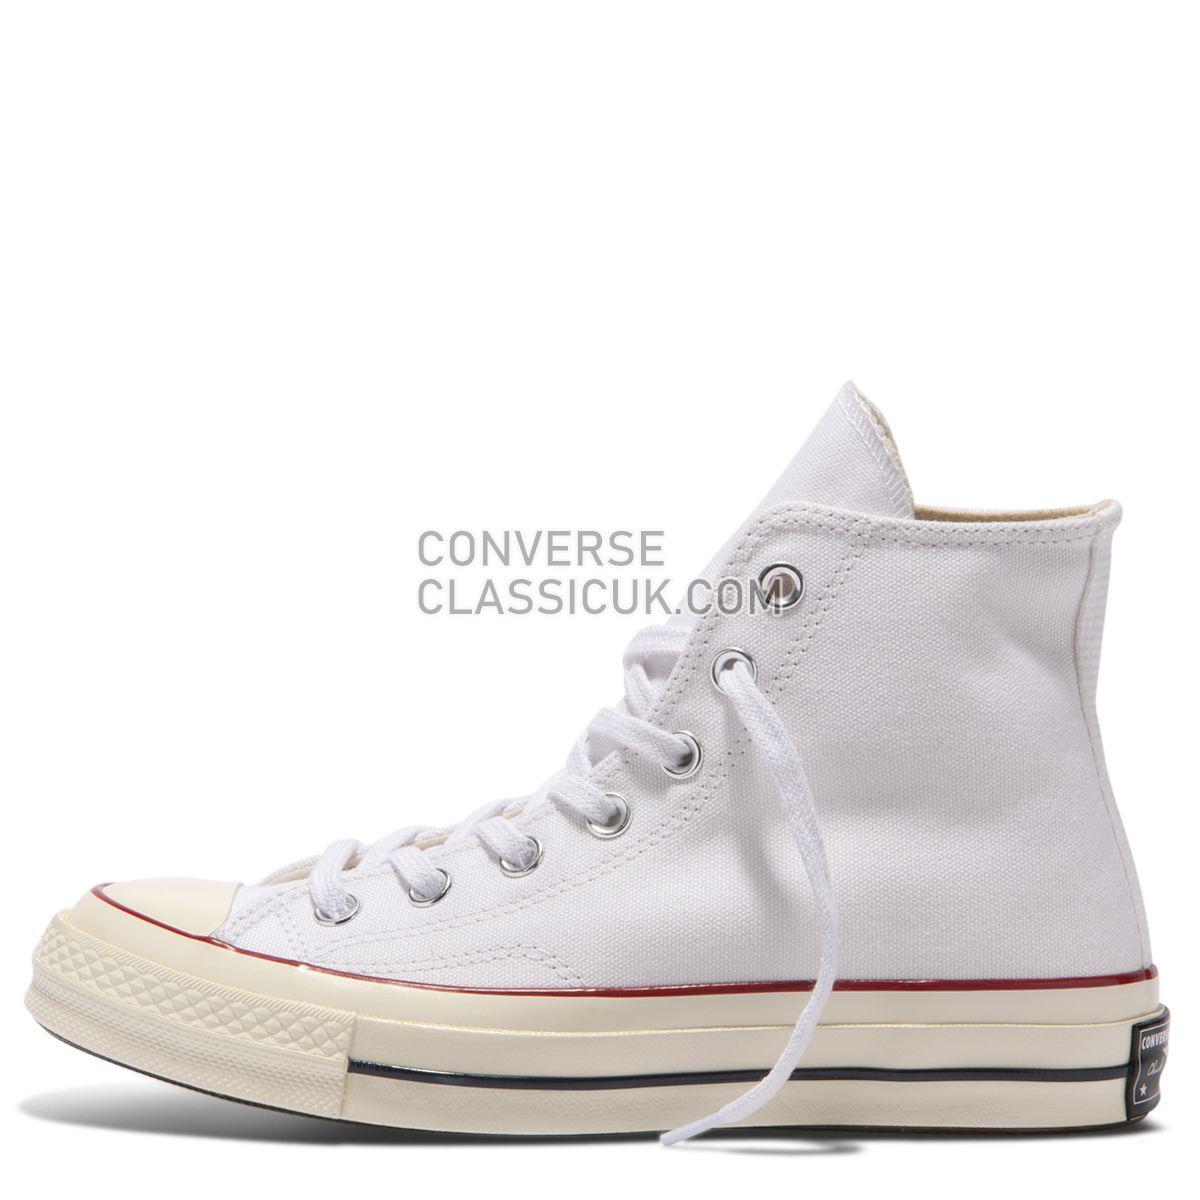 Converse Chuck Taylor All Star 70 High Top White Mens Womens Unisex 162056 White/Garnet/Egret Shoes